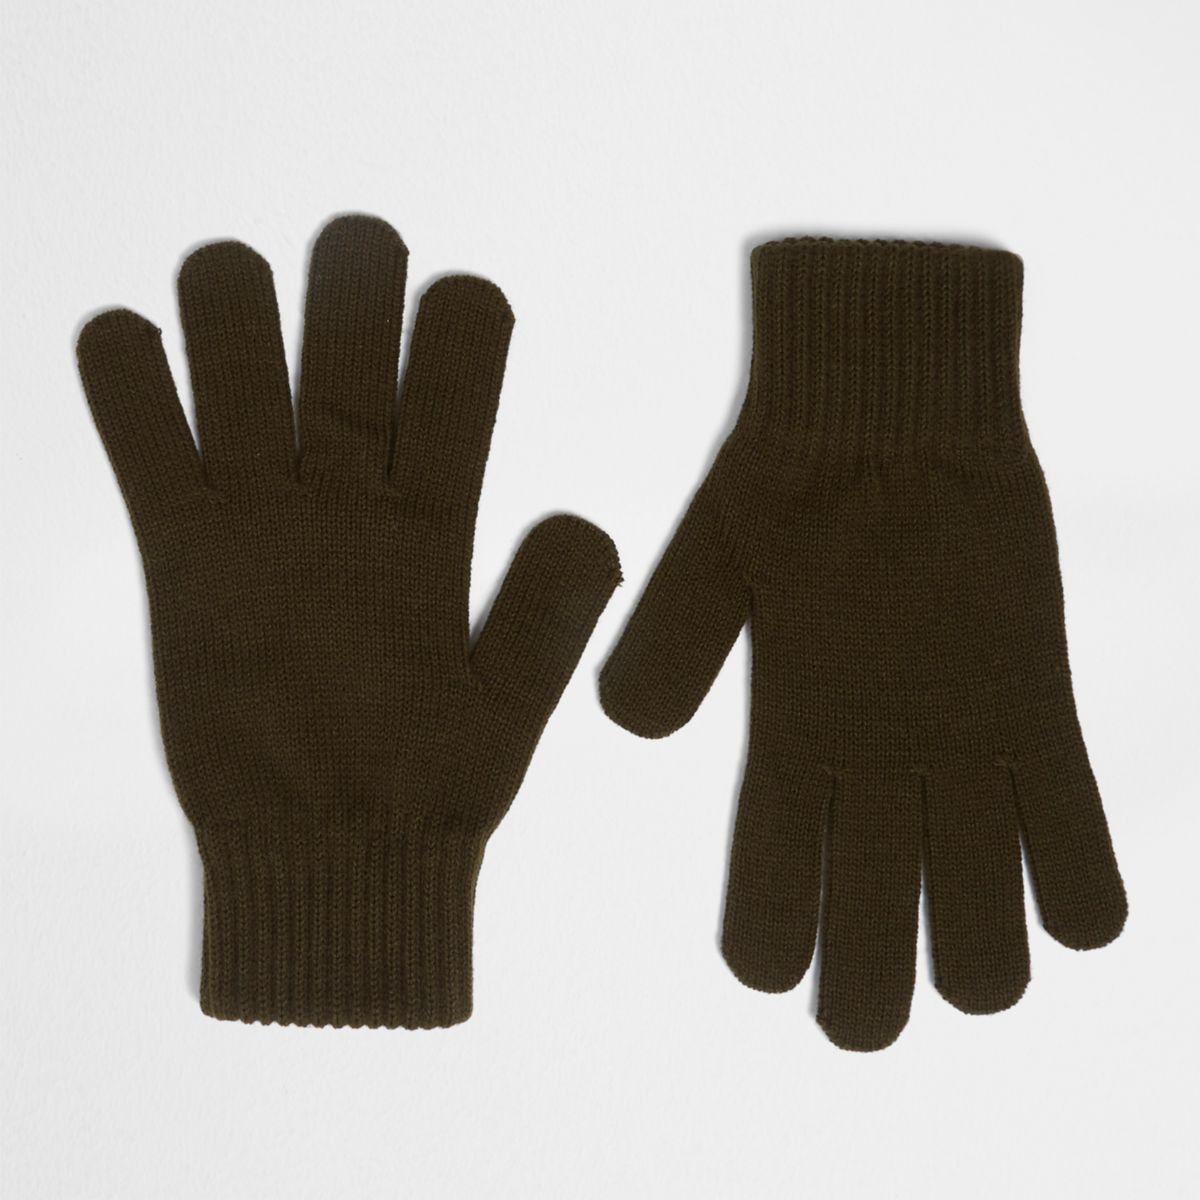 Khaki green knit gloves